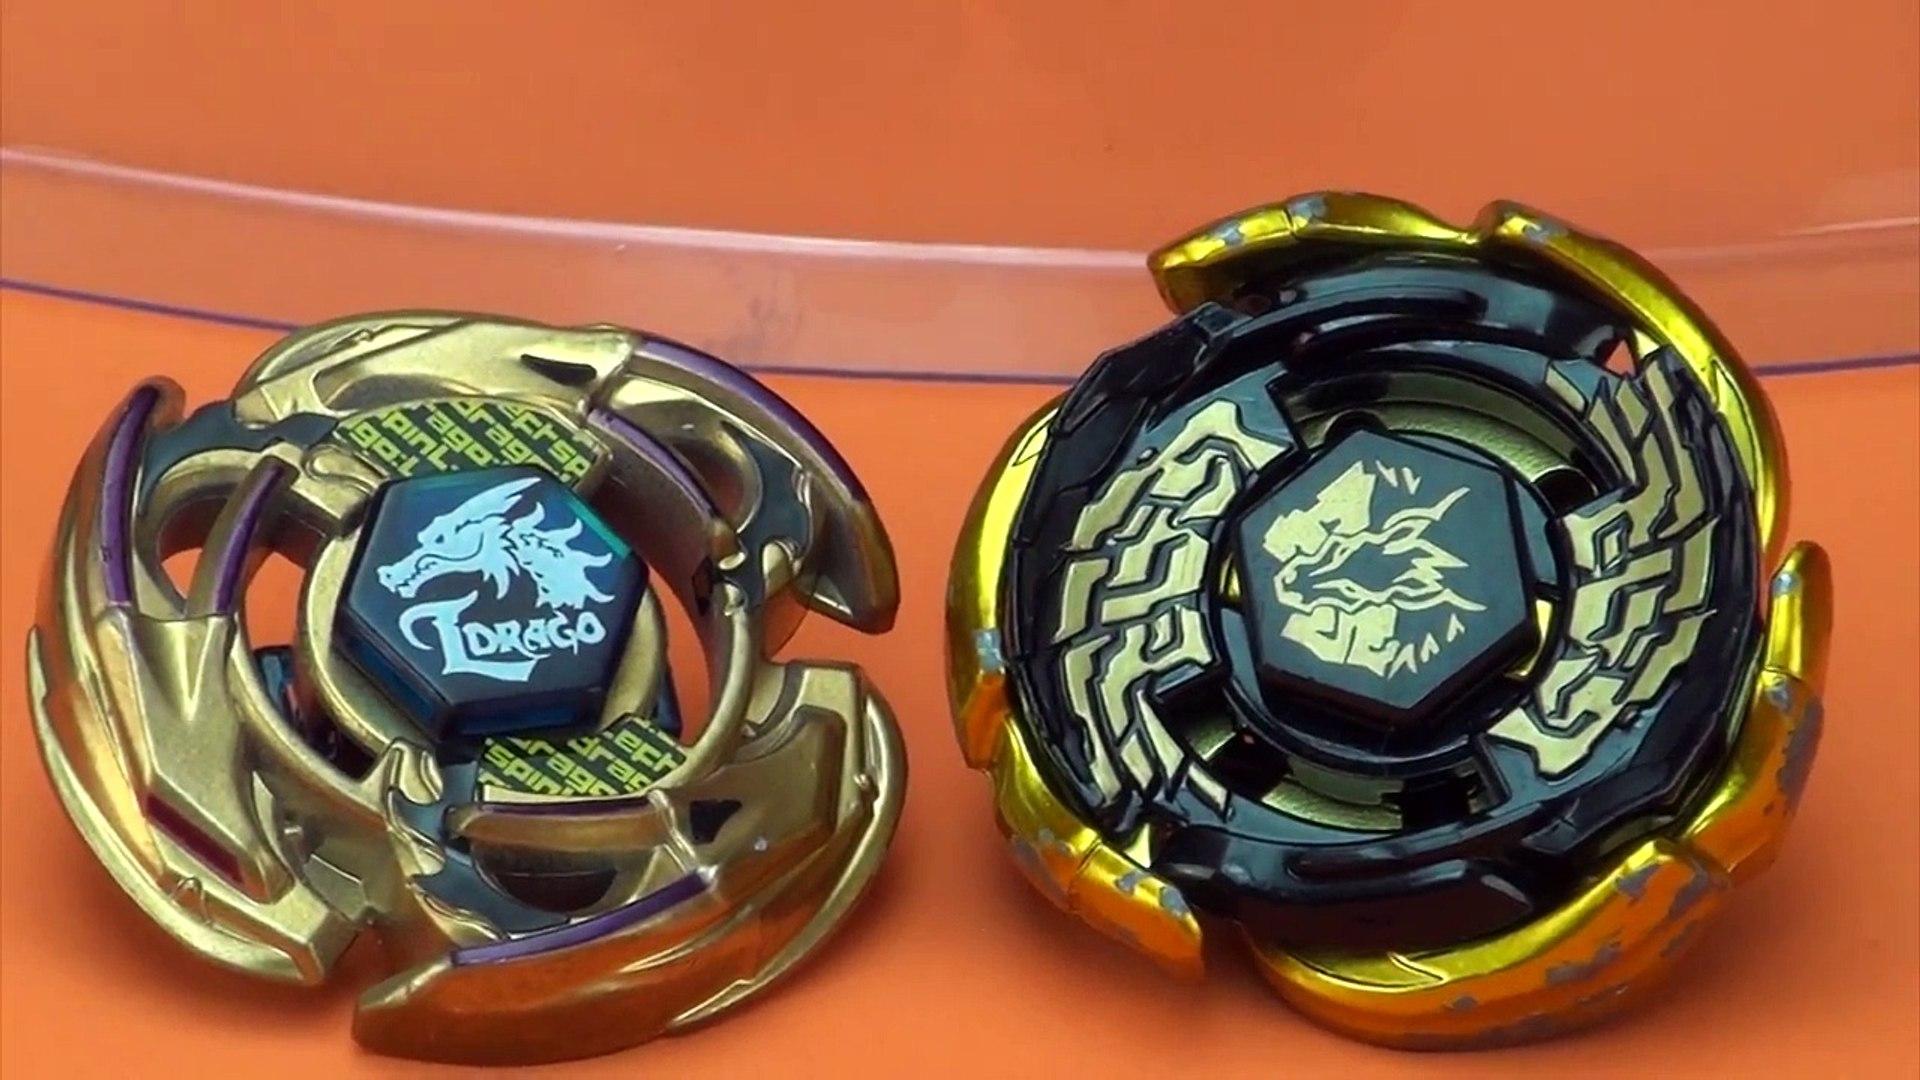 BB105 WBBA LTD GOLD BIG BANG Pegasus Takara Tomy  BB-108 L Drago Destroy F:S